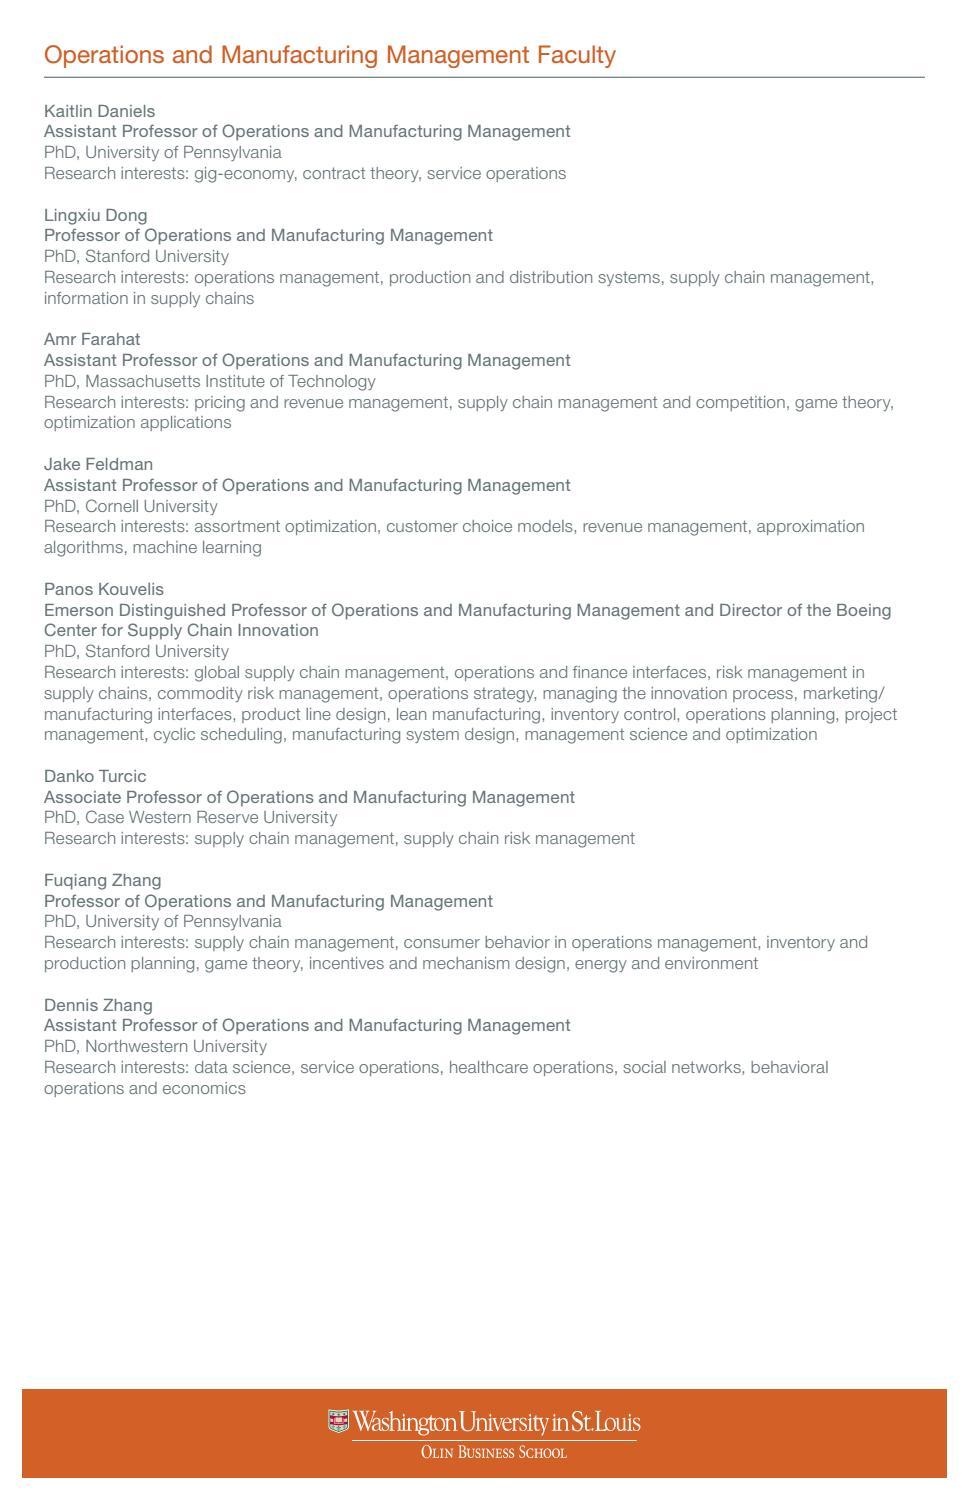 Olin Business School PhD Brochure (9/22/16) by Olin Business